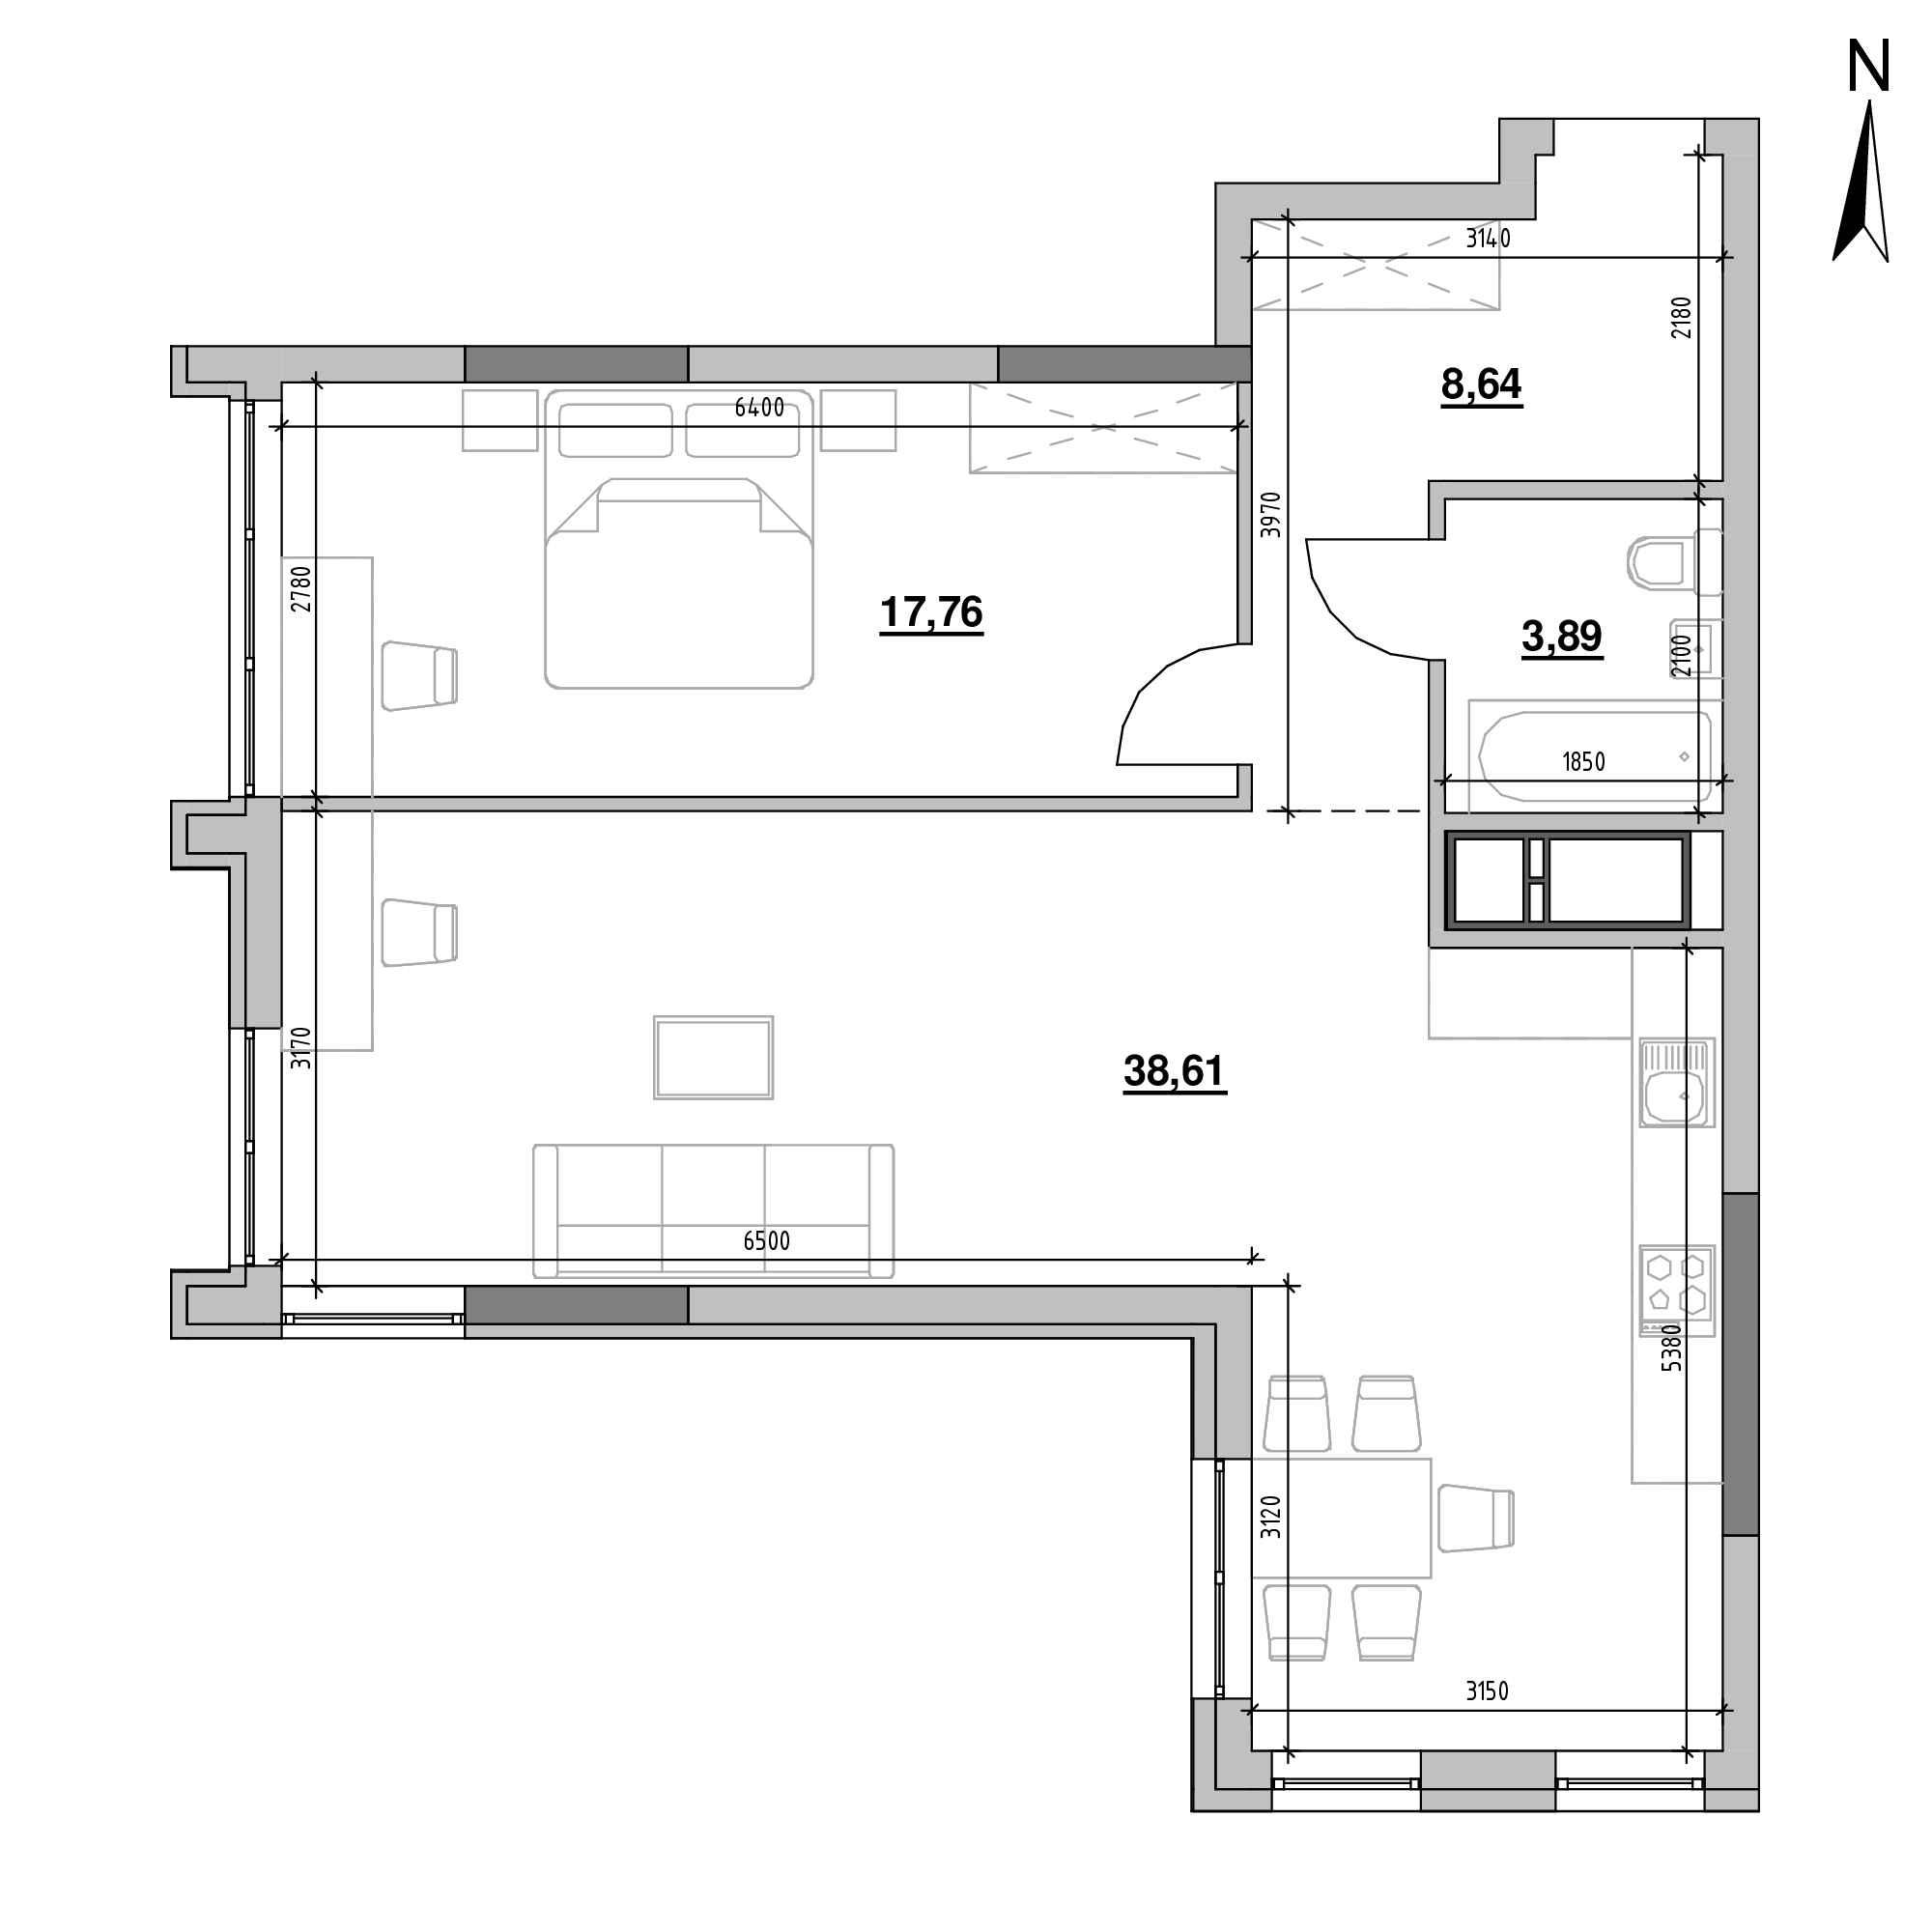 ЖК Nordica Residence: планування 1-кімнатної квартири, №3, 68.9 м<sup>2</sup>